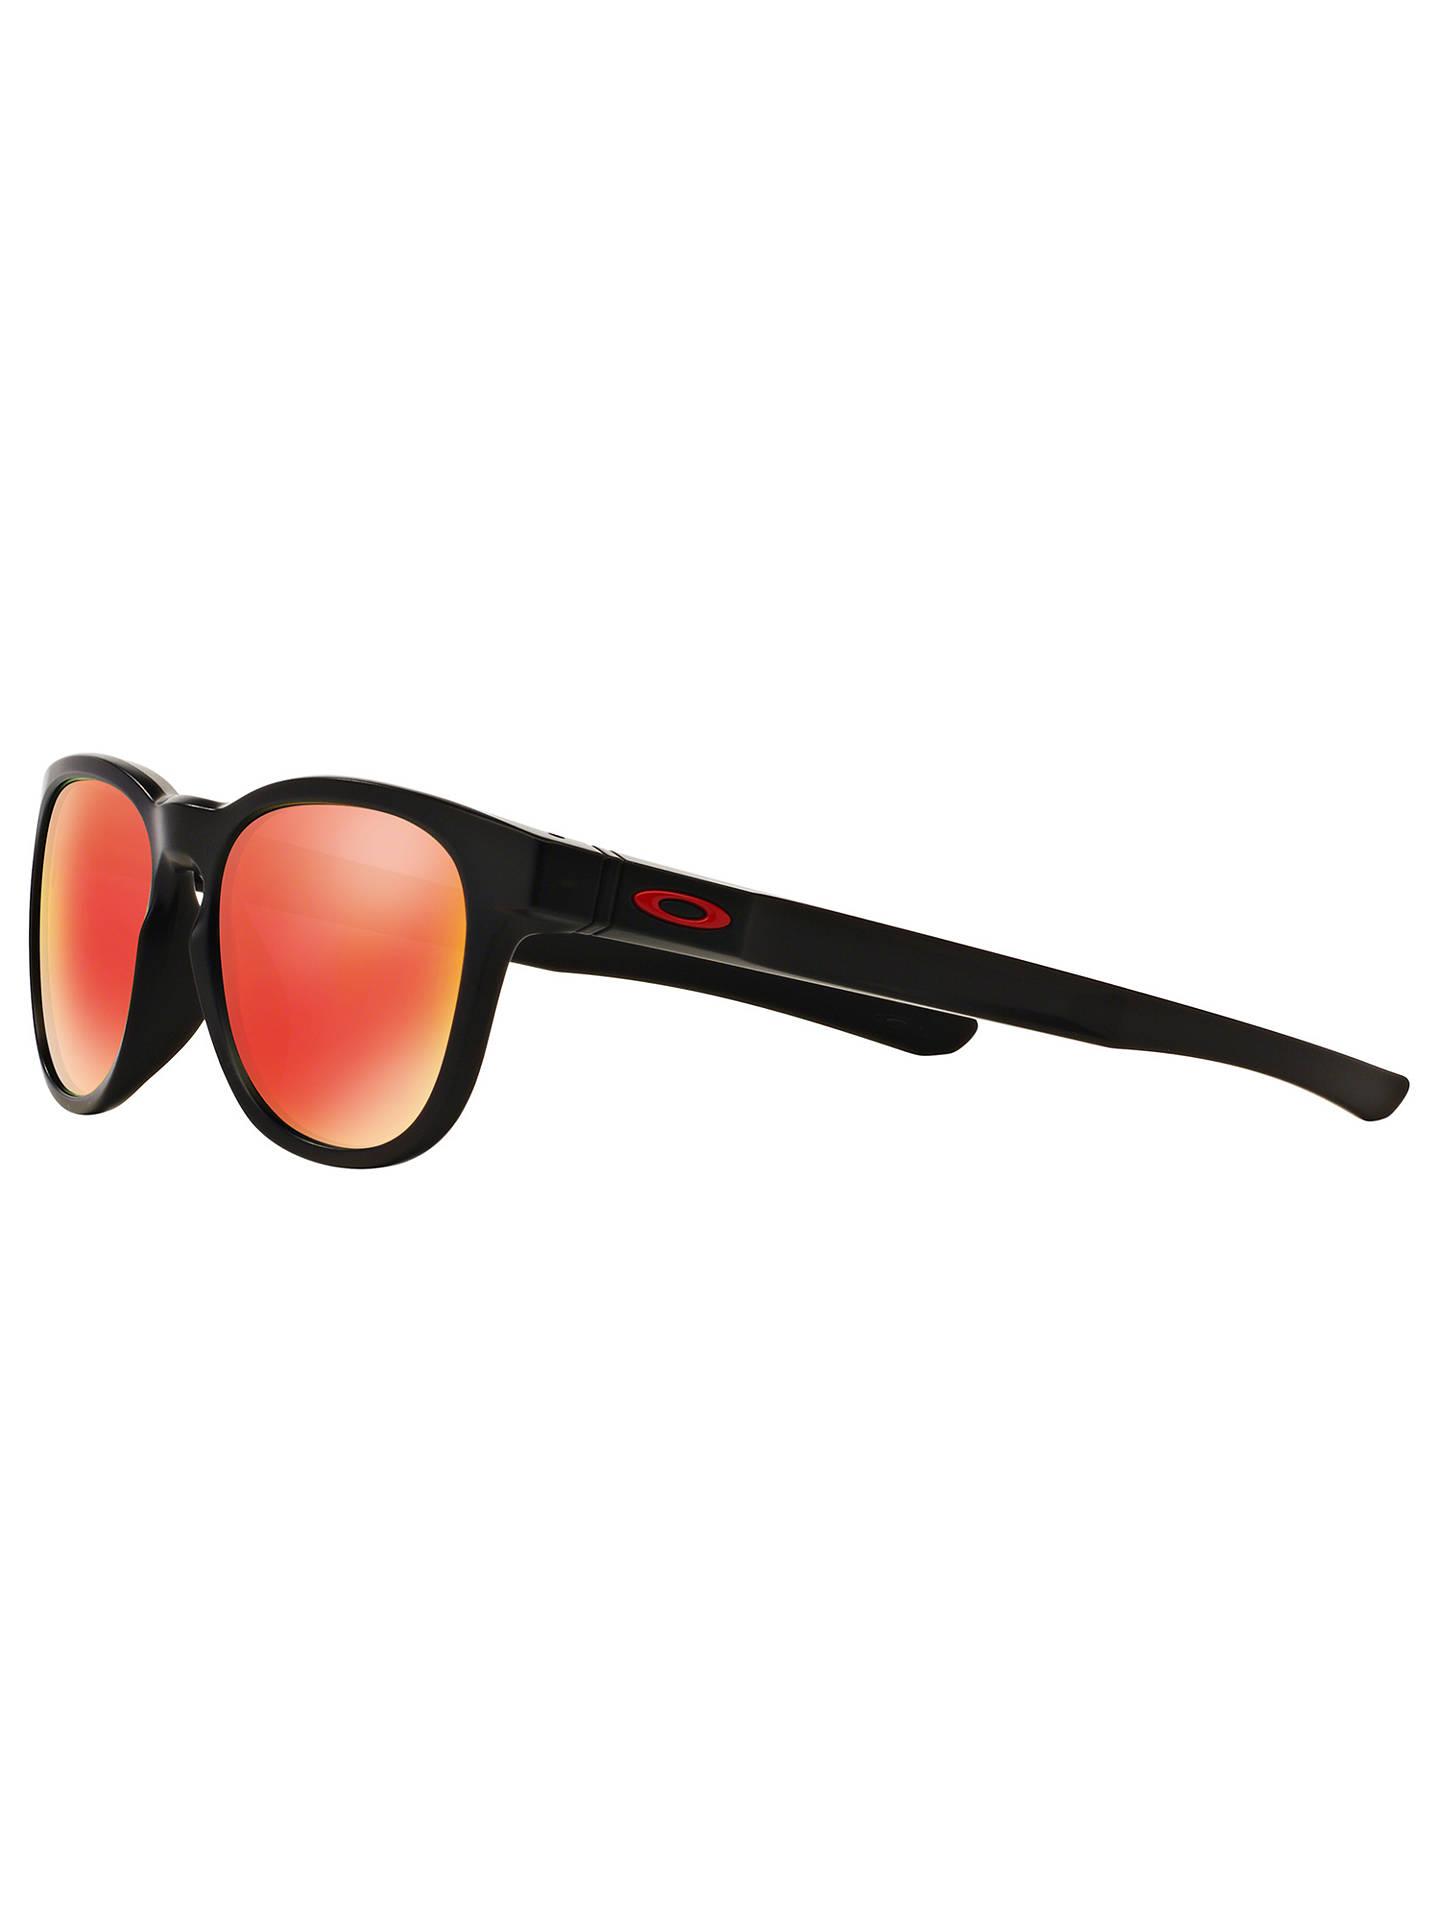 73ebcaad418 Oakley OO9315 Stringer D-Frame Sunglasses at John Lewis   Partners